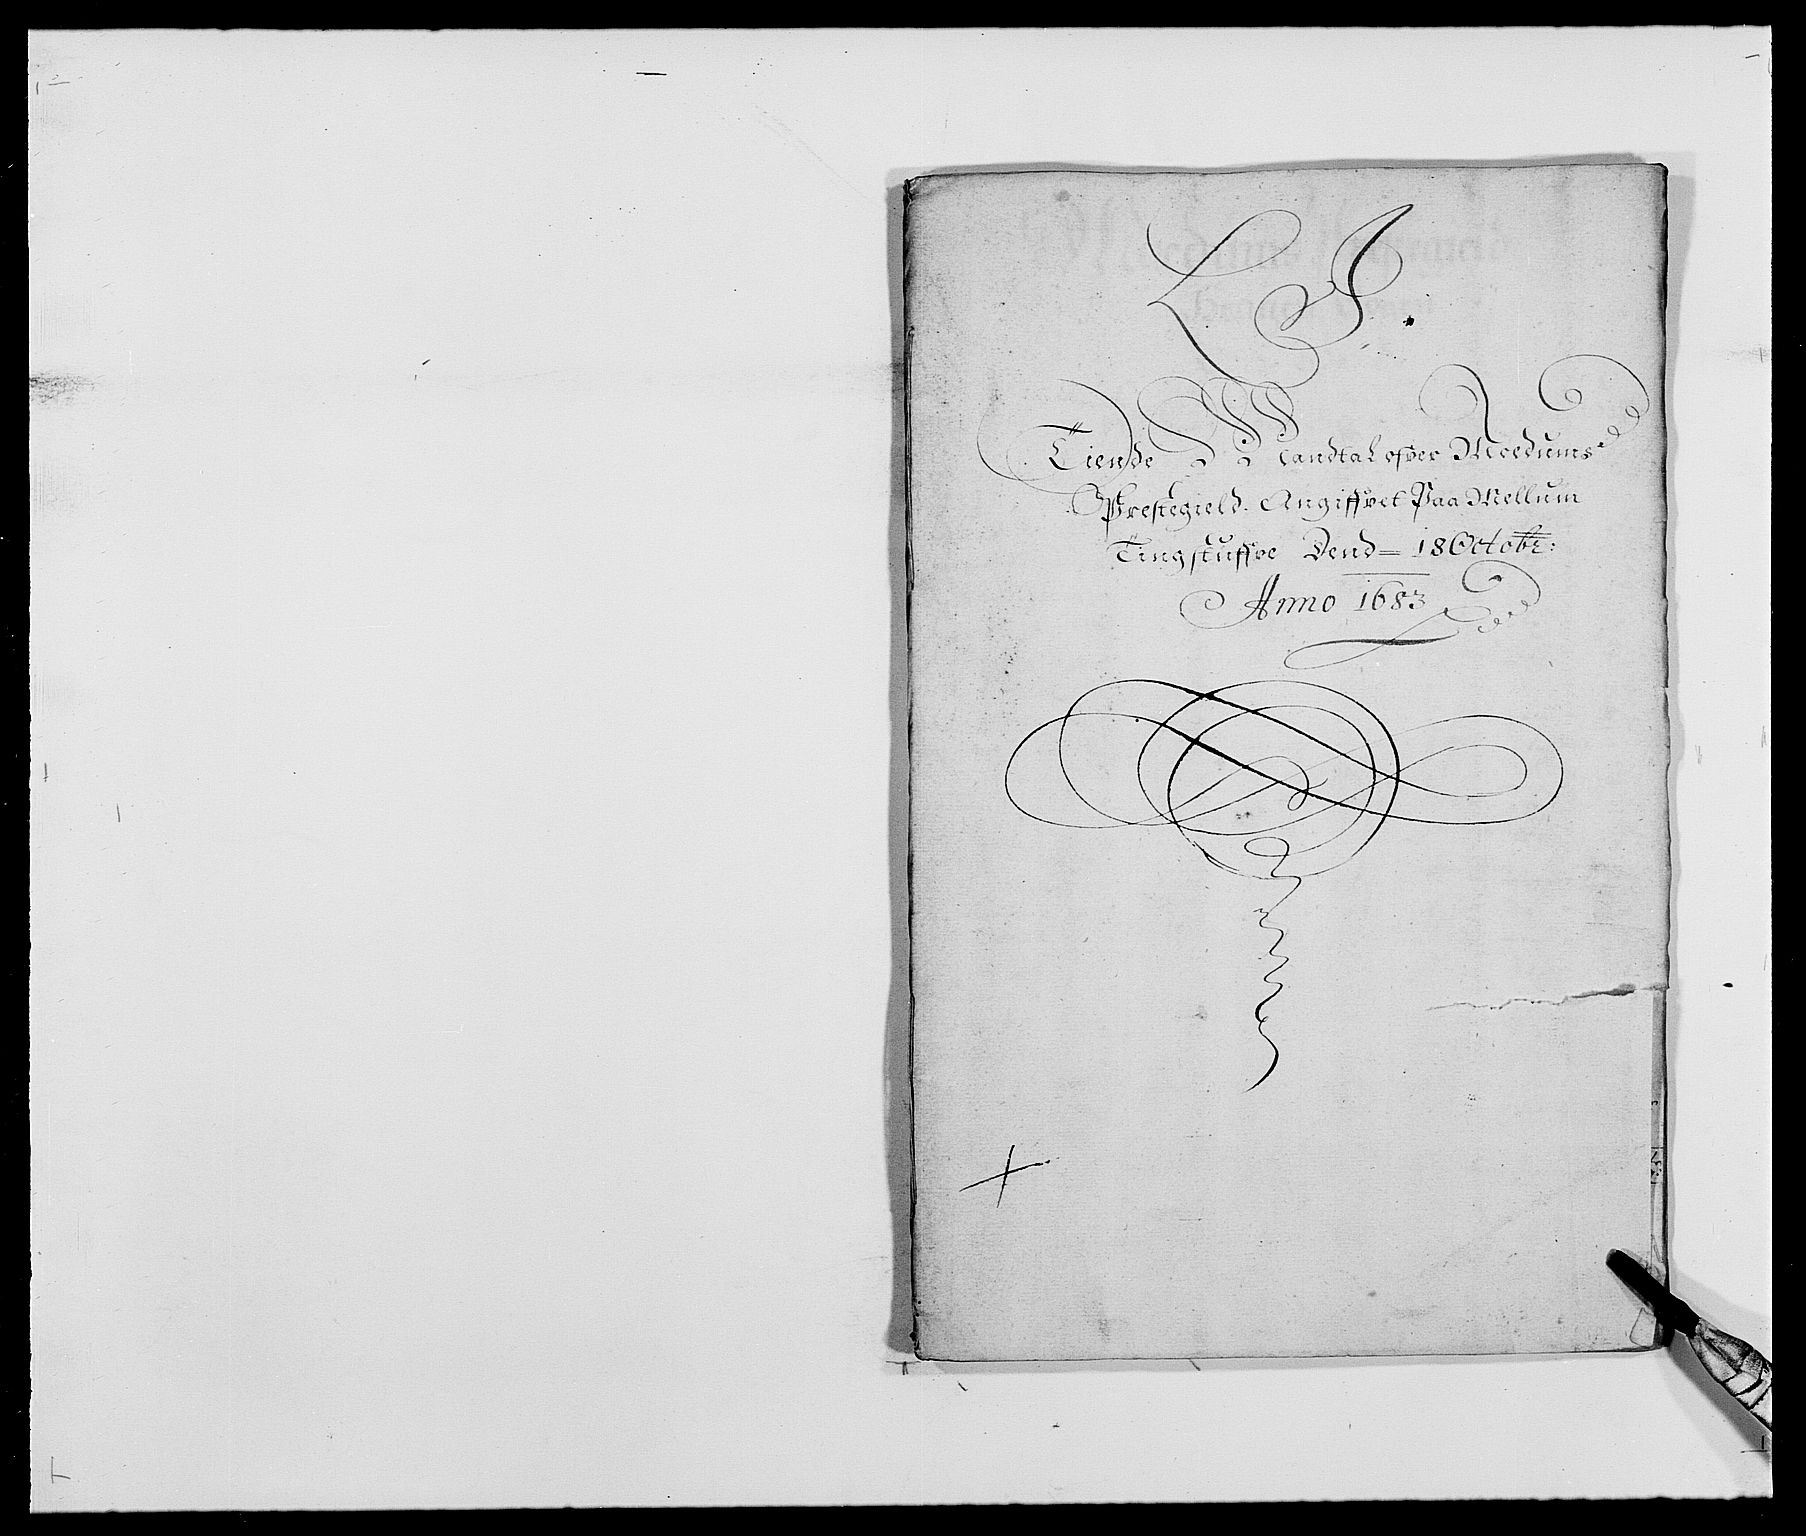 RA, Rentekammeret inntil 1814, Reviderte regnskaper, Fogderegnskap, R25/L1677: Fogderegnskap Buskerud, 1683-1684, s. 153